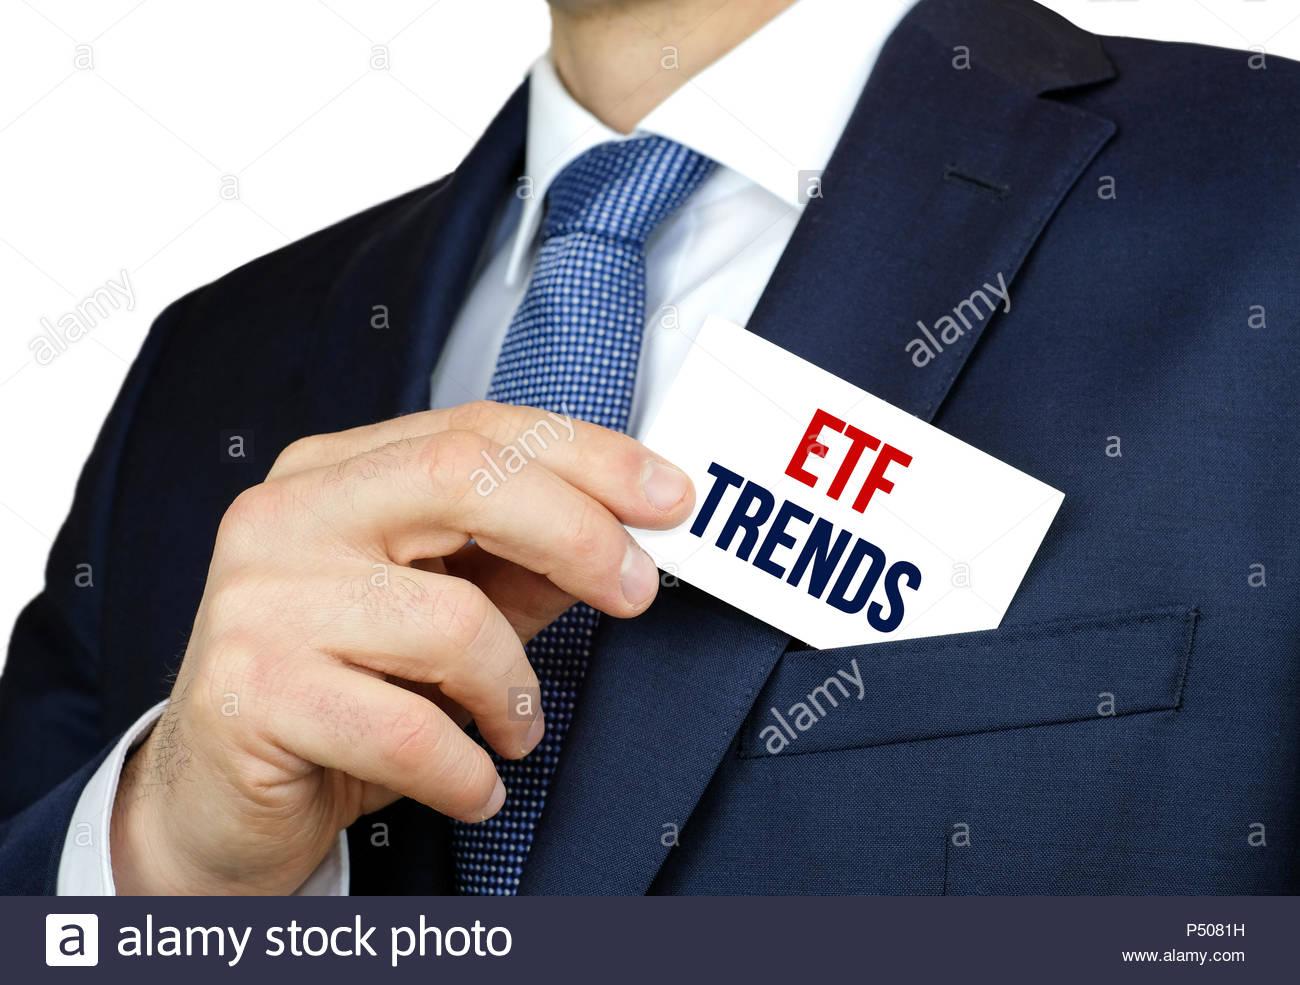 ETF Trends - exchange traded fund stock market - Stock Image